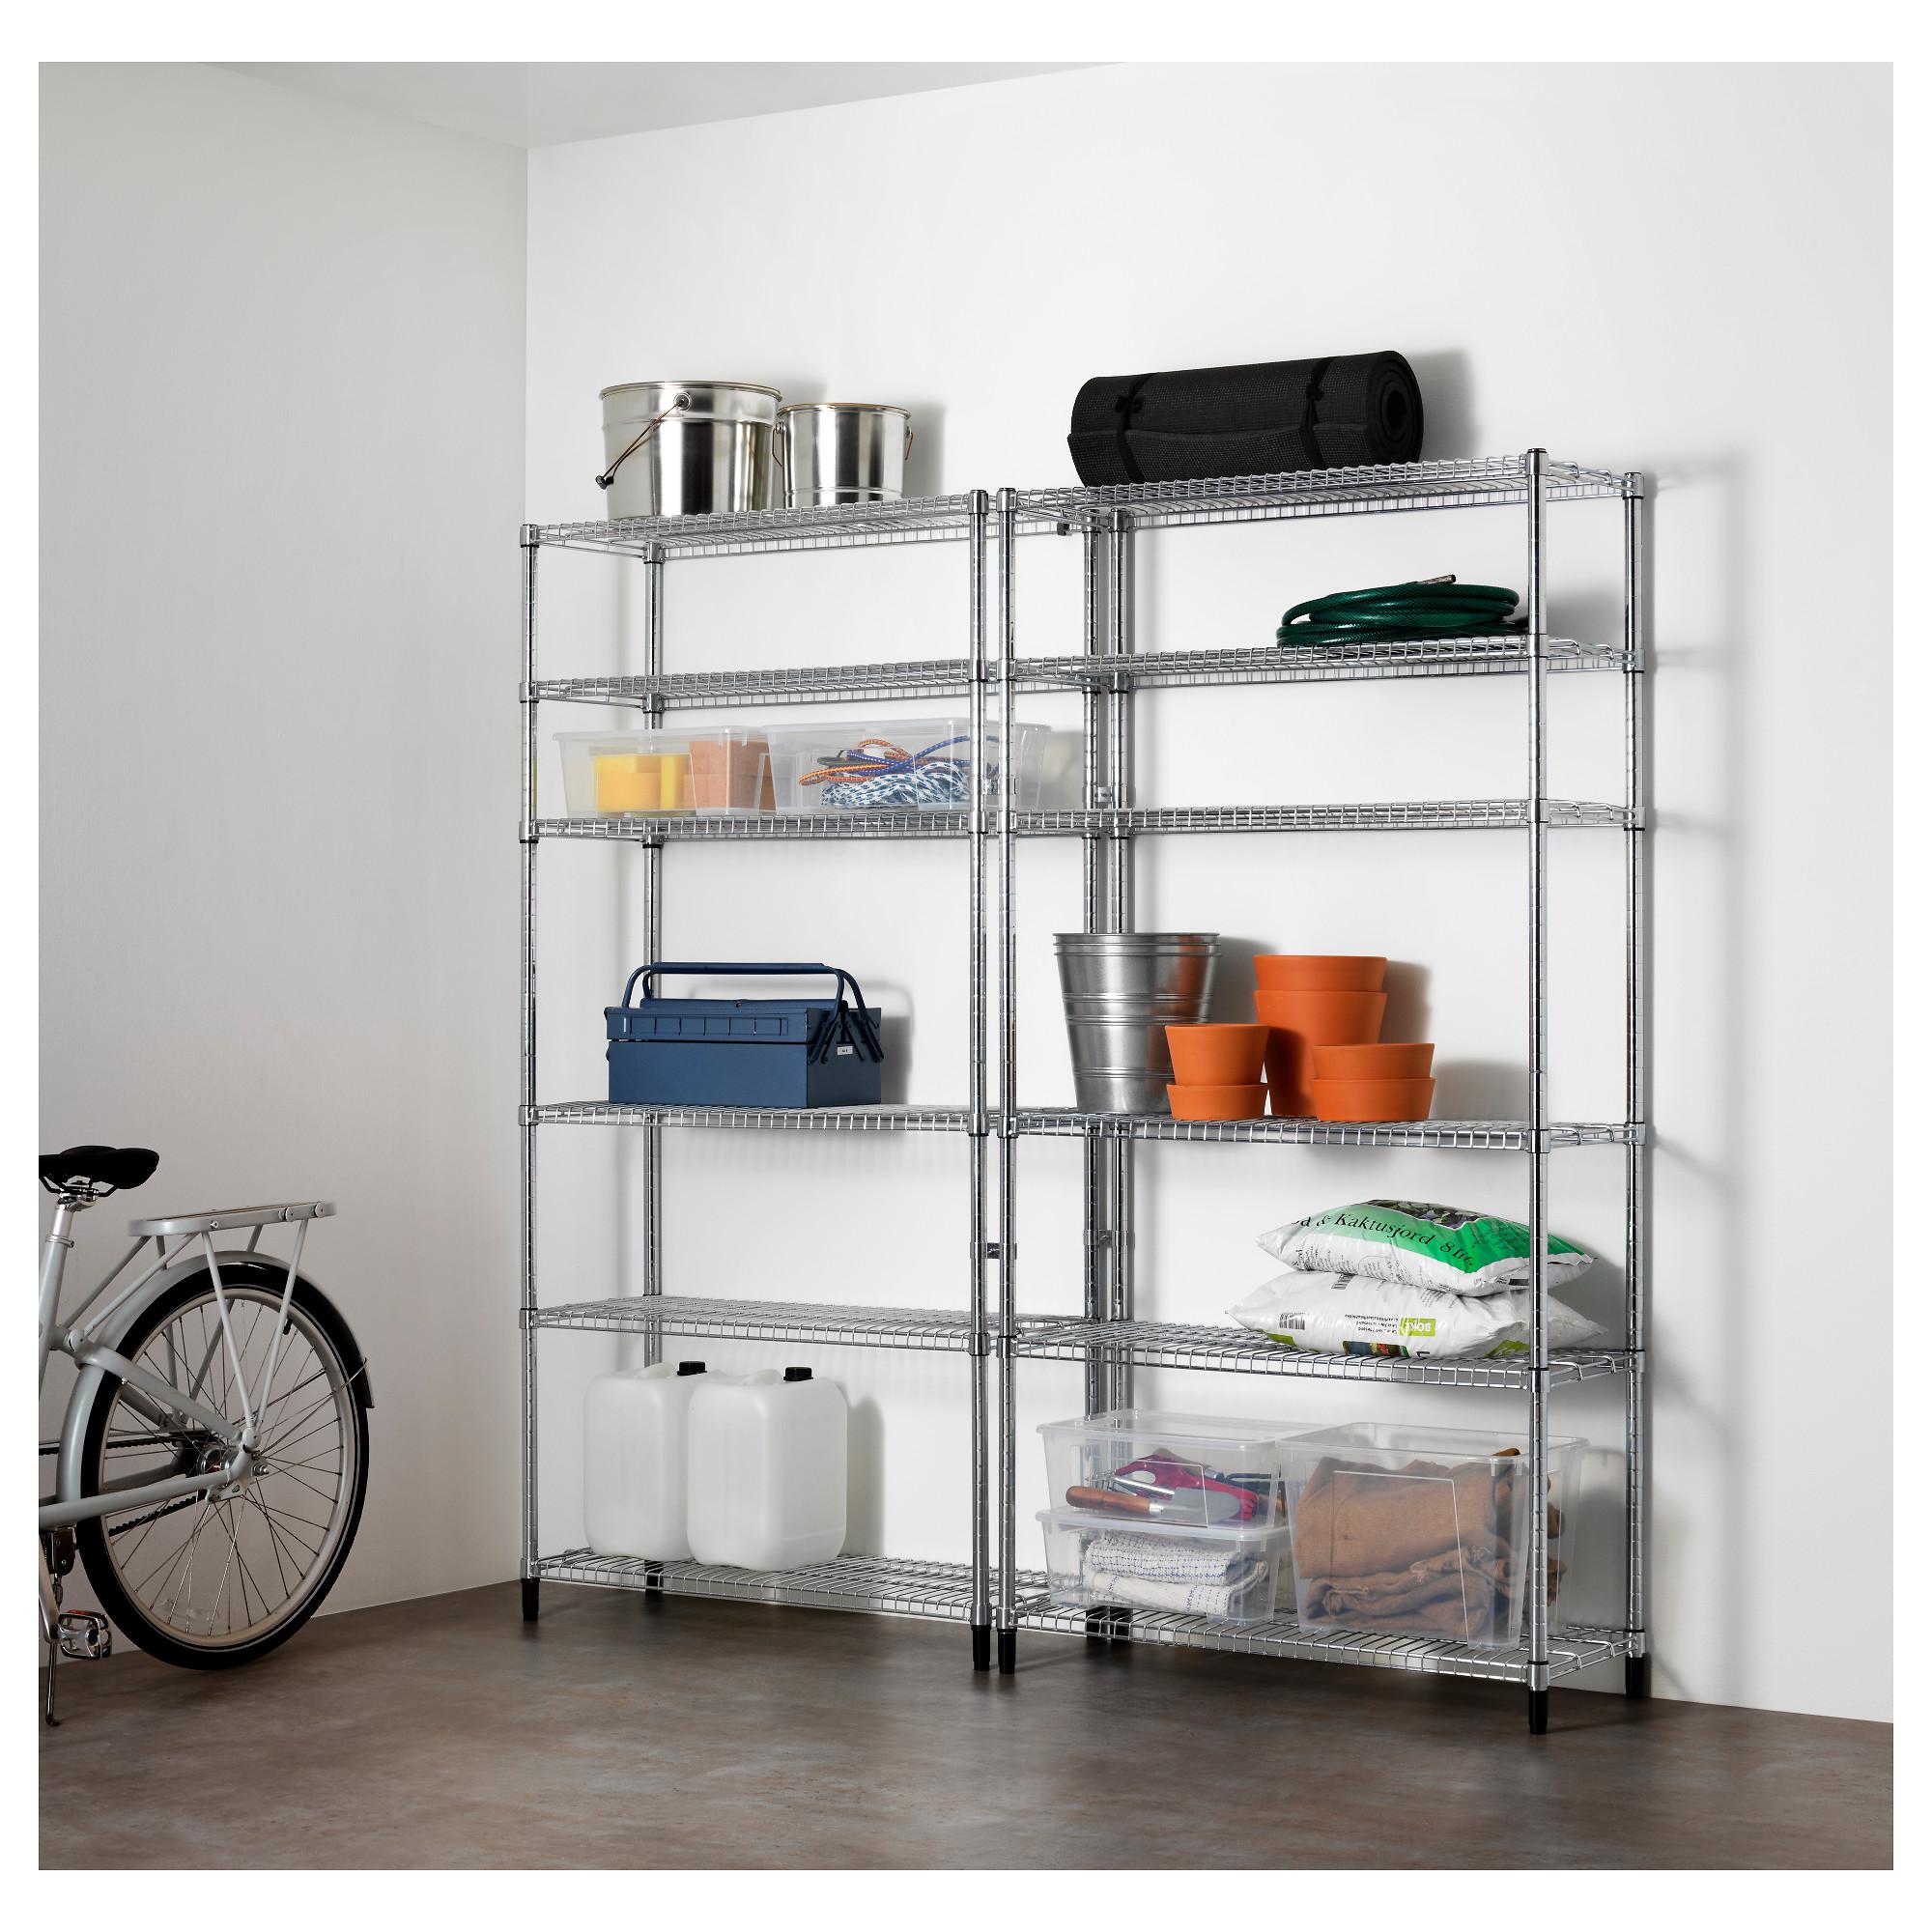 2 секции полок ОМАР артикуль № 491.875.48 в наличии. Онлайн каталог IKEA Беларусь. Недорогая доставка и монтаж.